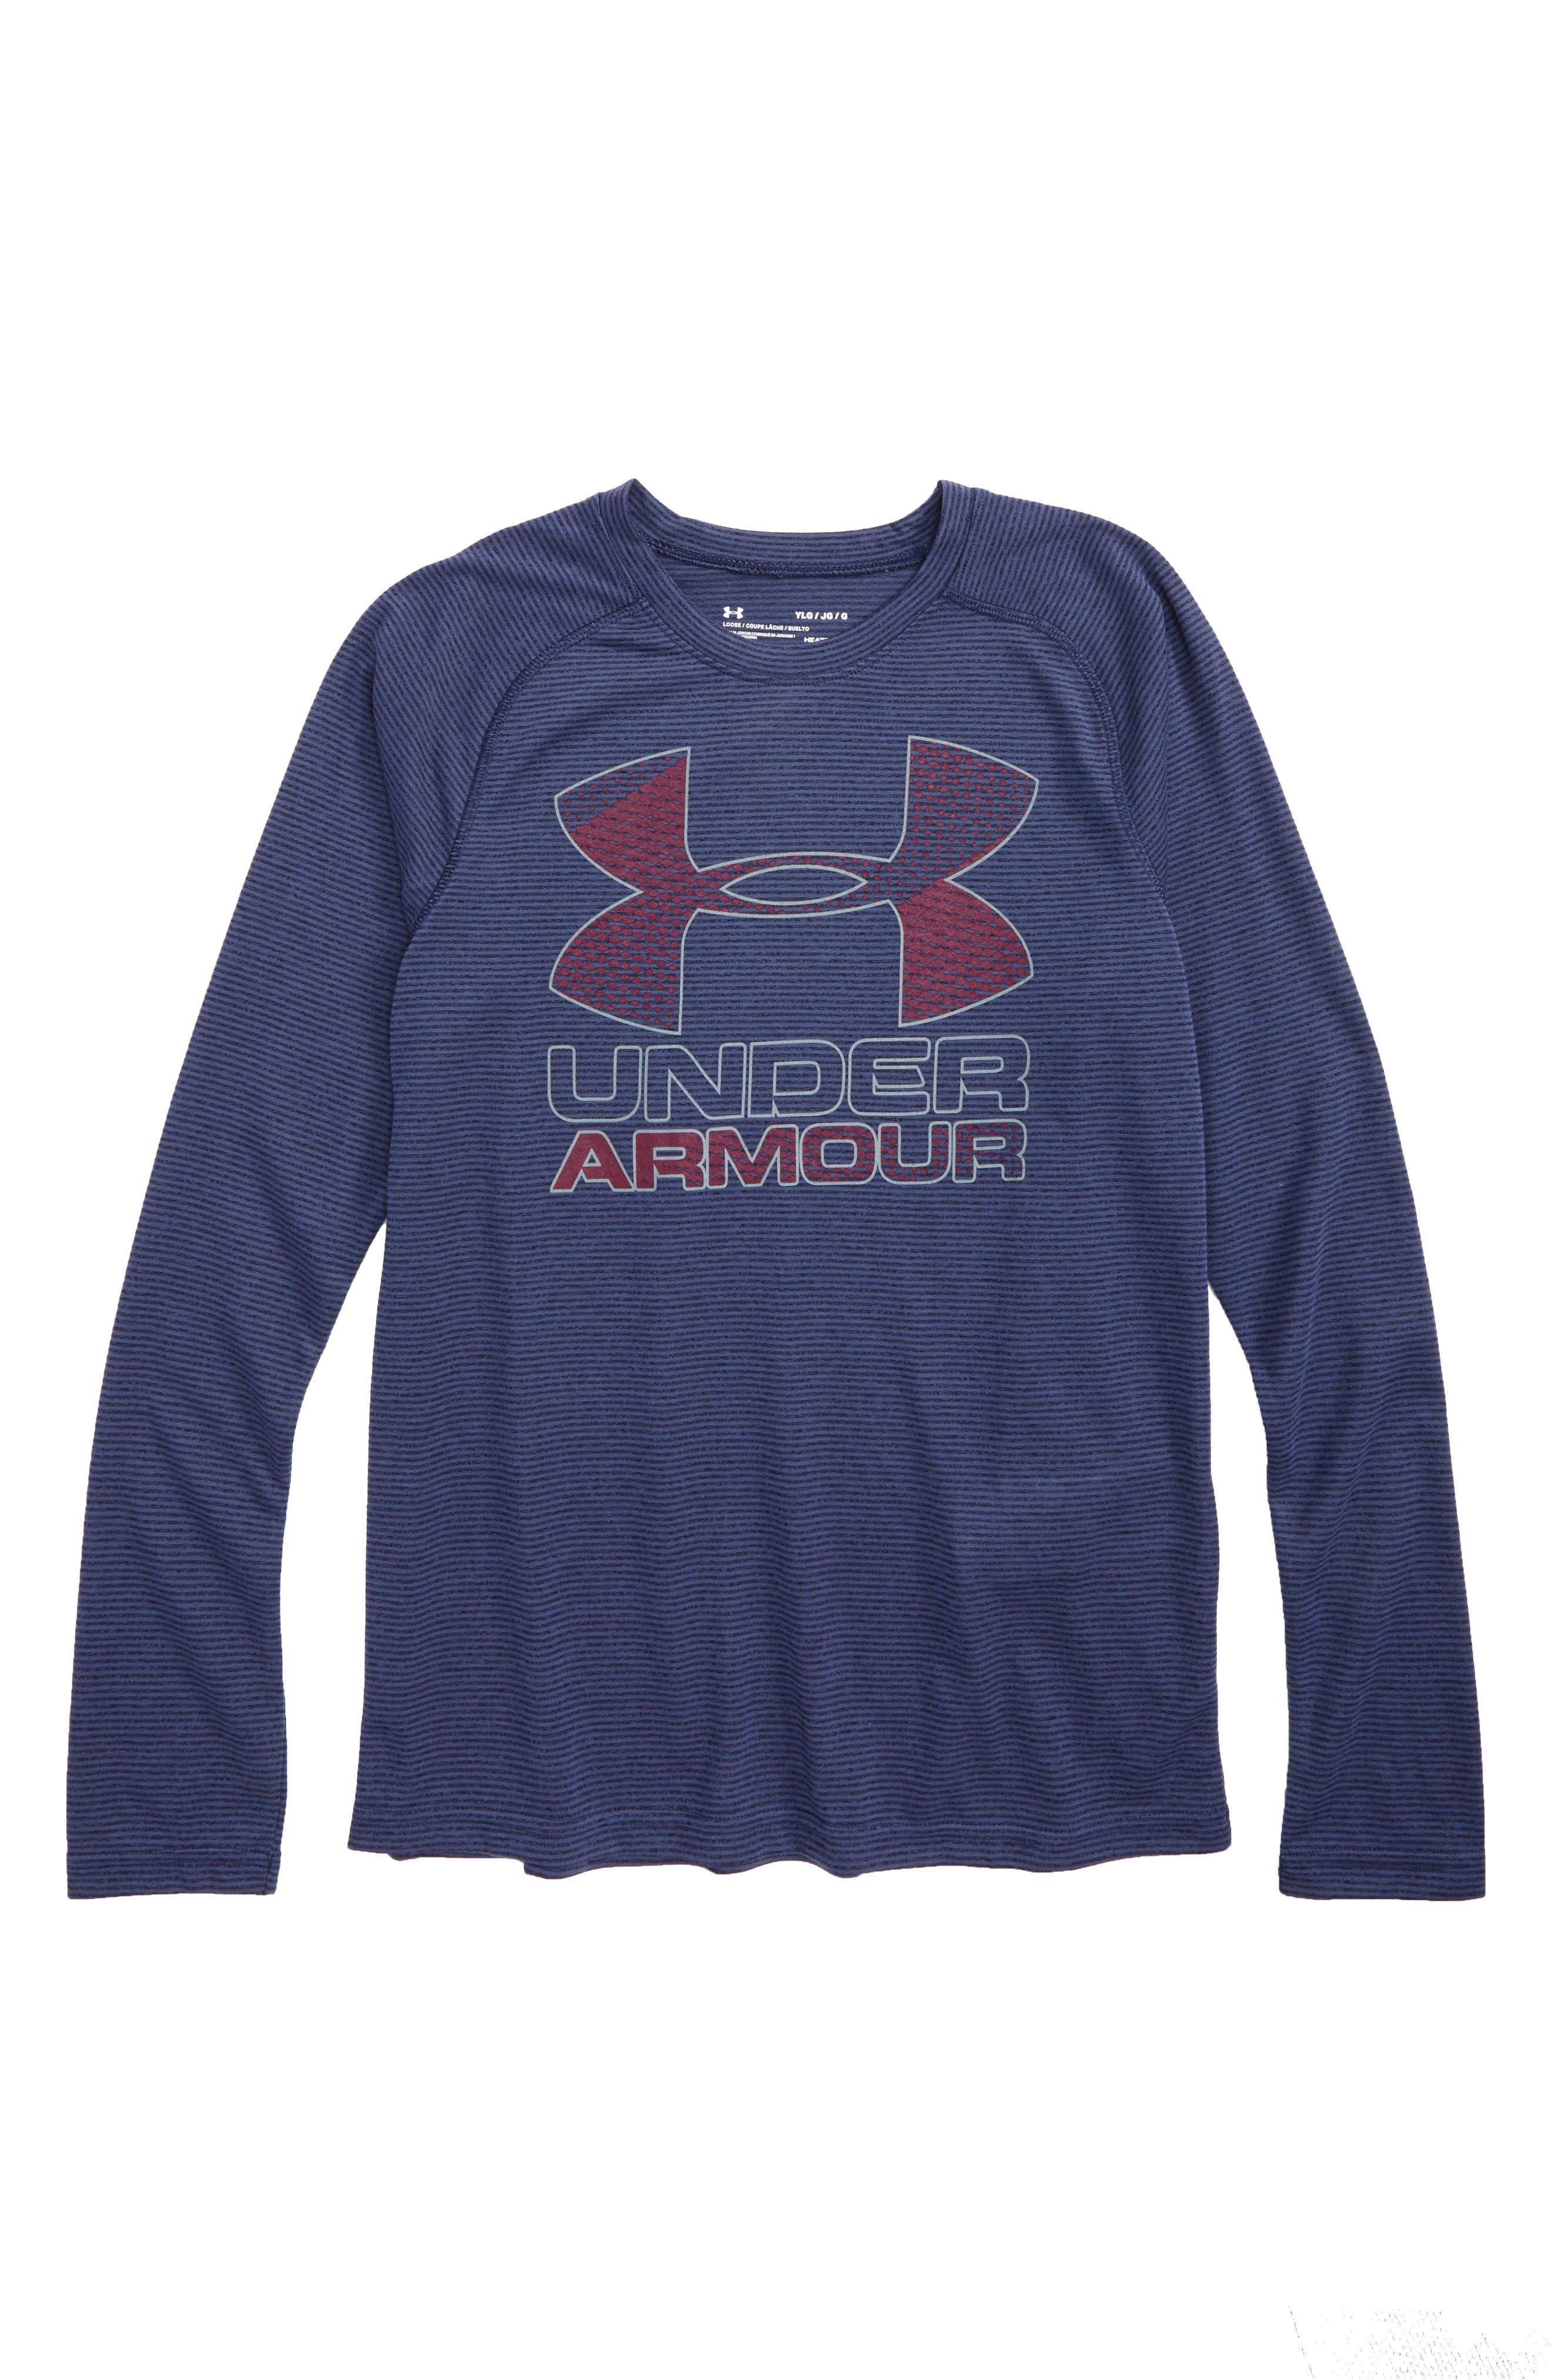 Alternate Image 1 Selected - Under Armour Logo Graphic HeatGear® T-Shirt (Little Boys & Big Boys)